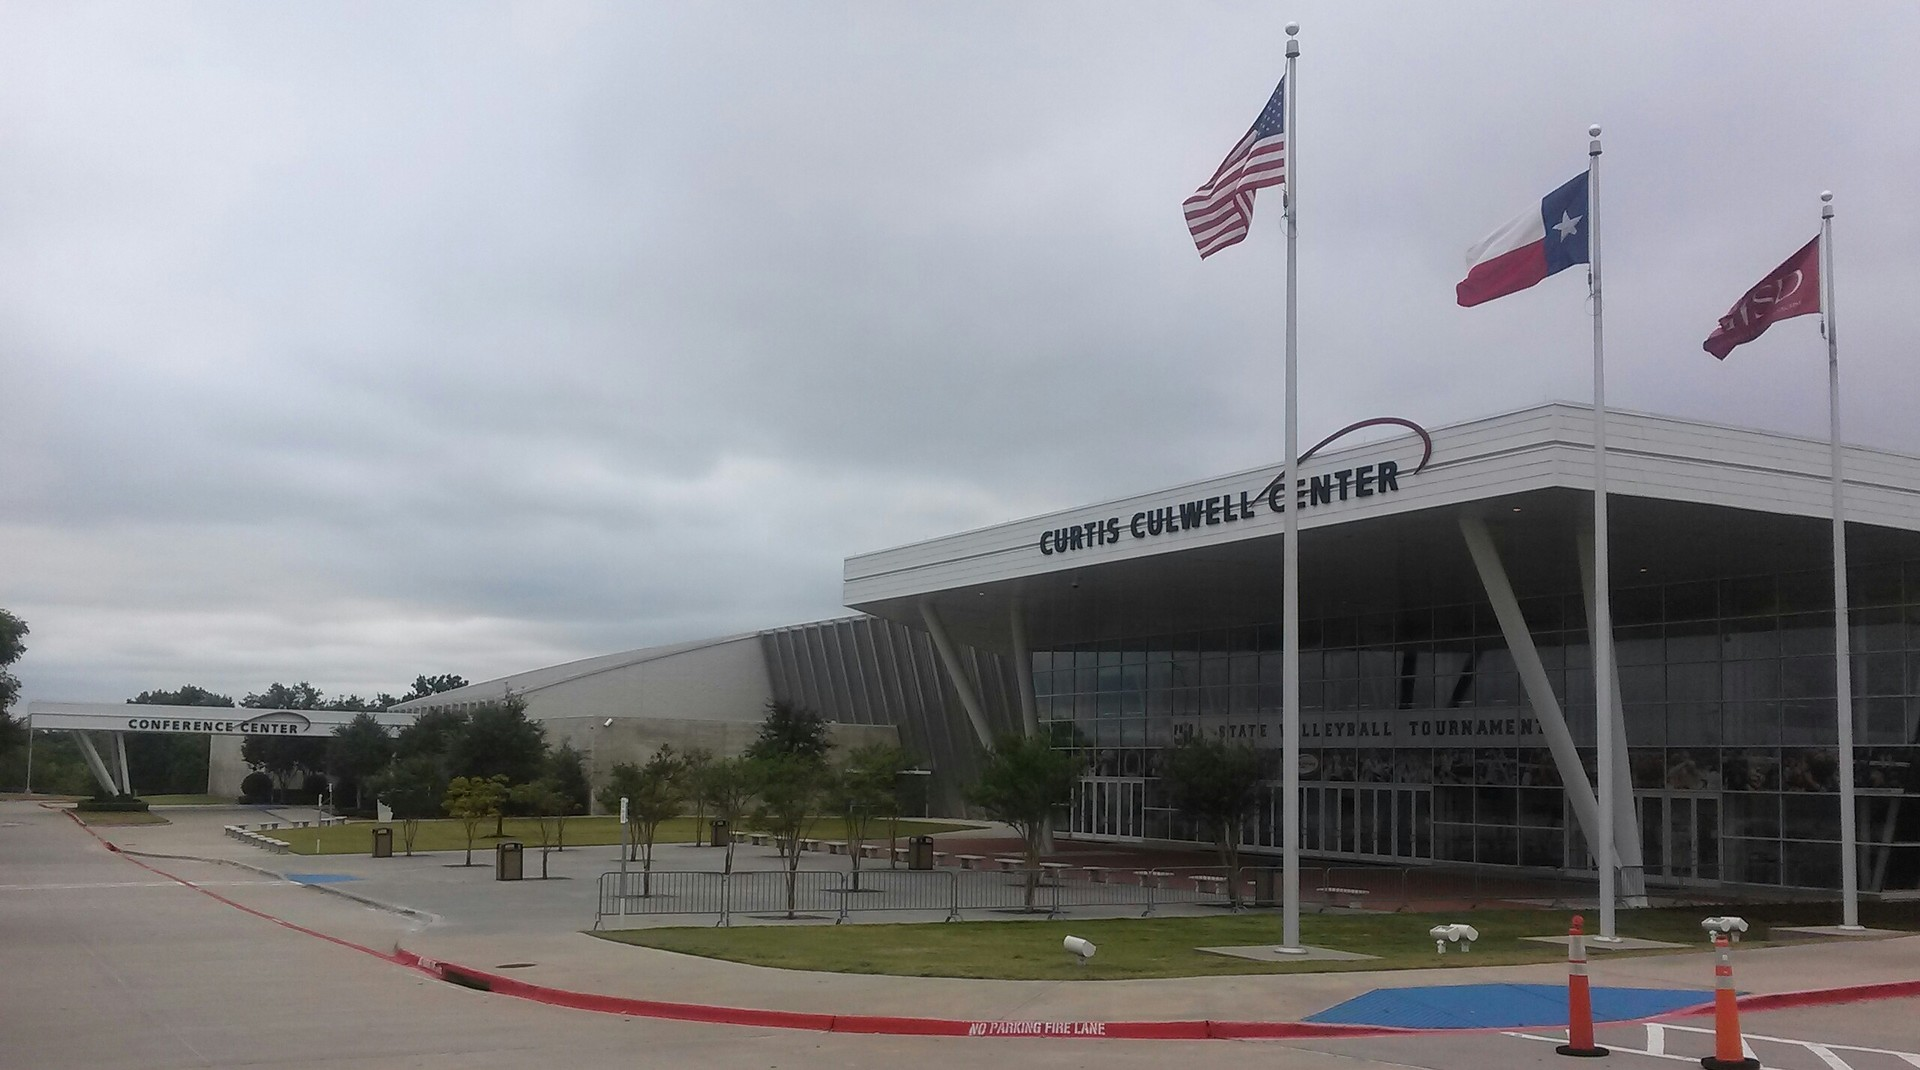 Le Curtis Culwell Center à Garland, Texas. Lieu de la fusillade du 3 mai 2015.